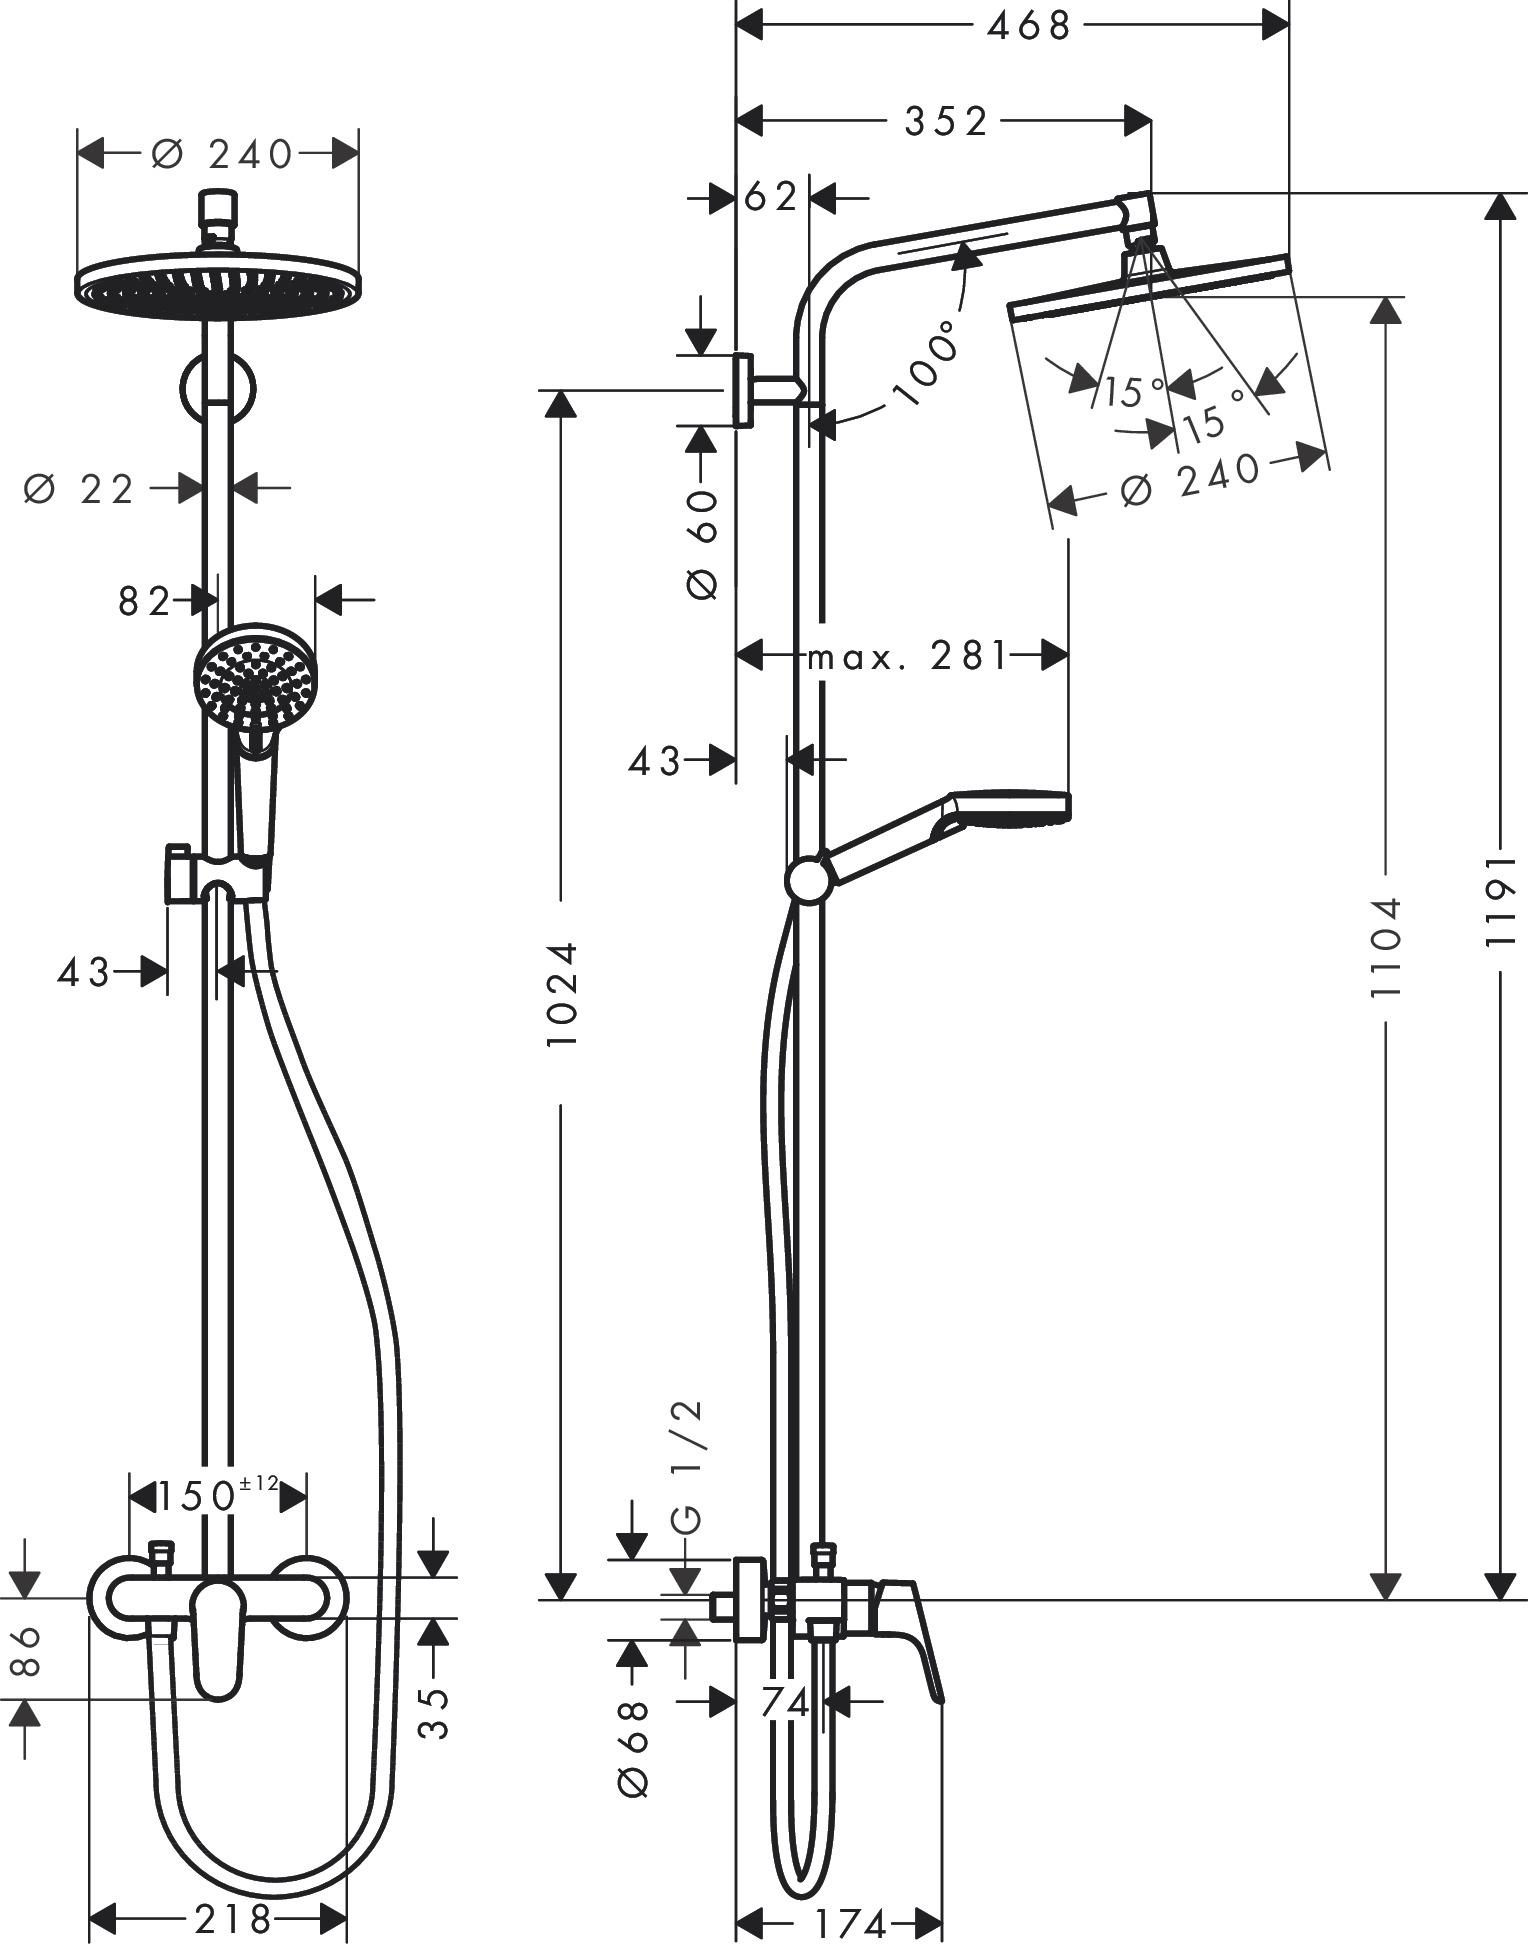 hansgrohe crometta crometta s 1 spray mode item no. Black Bedroom Furniture Sets. Home Design Ideas